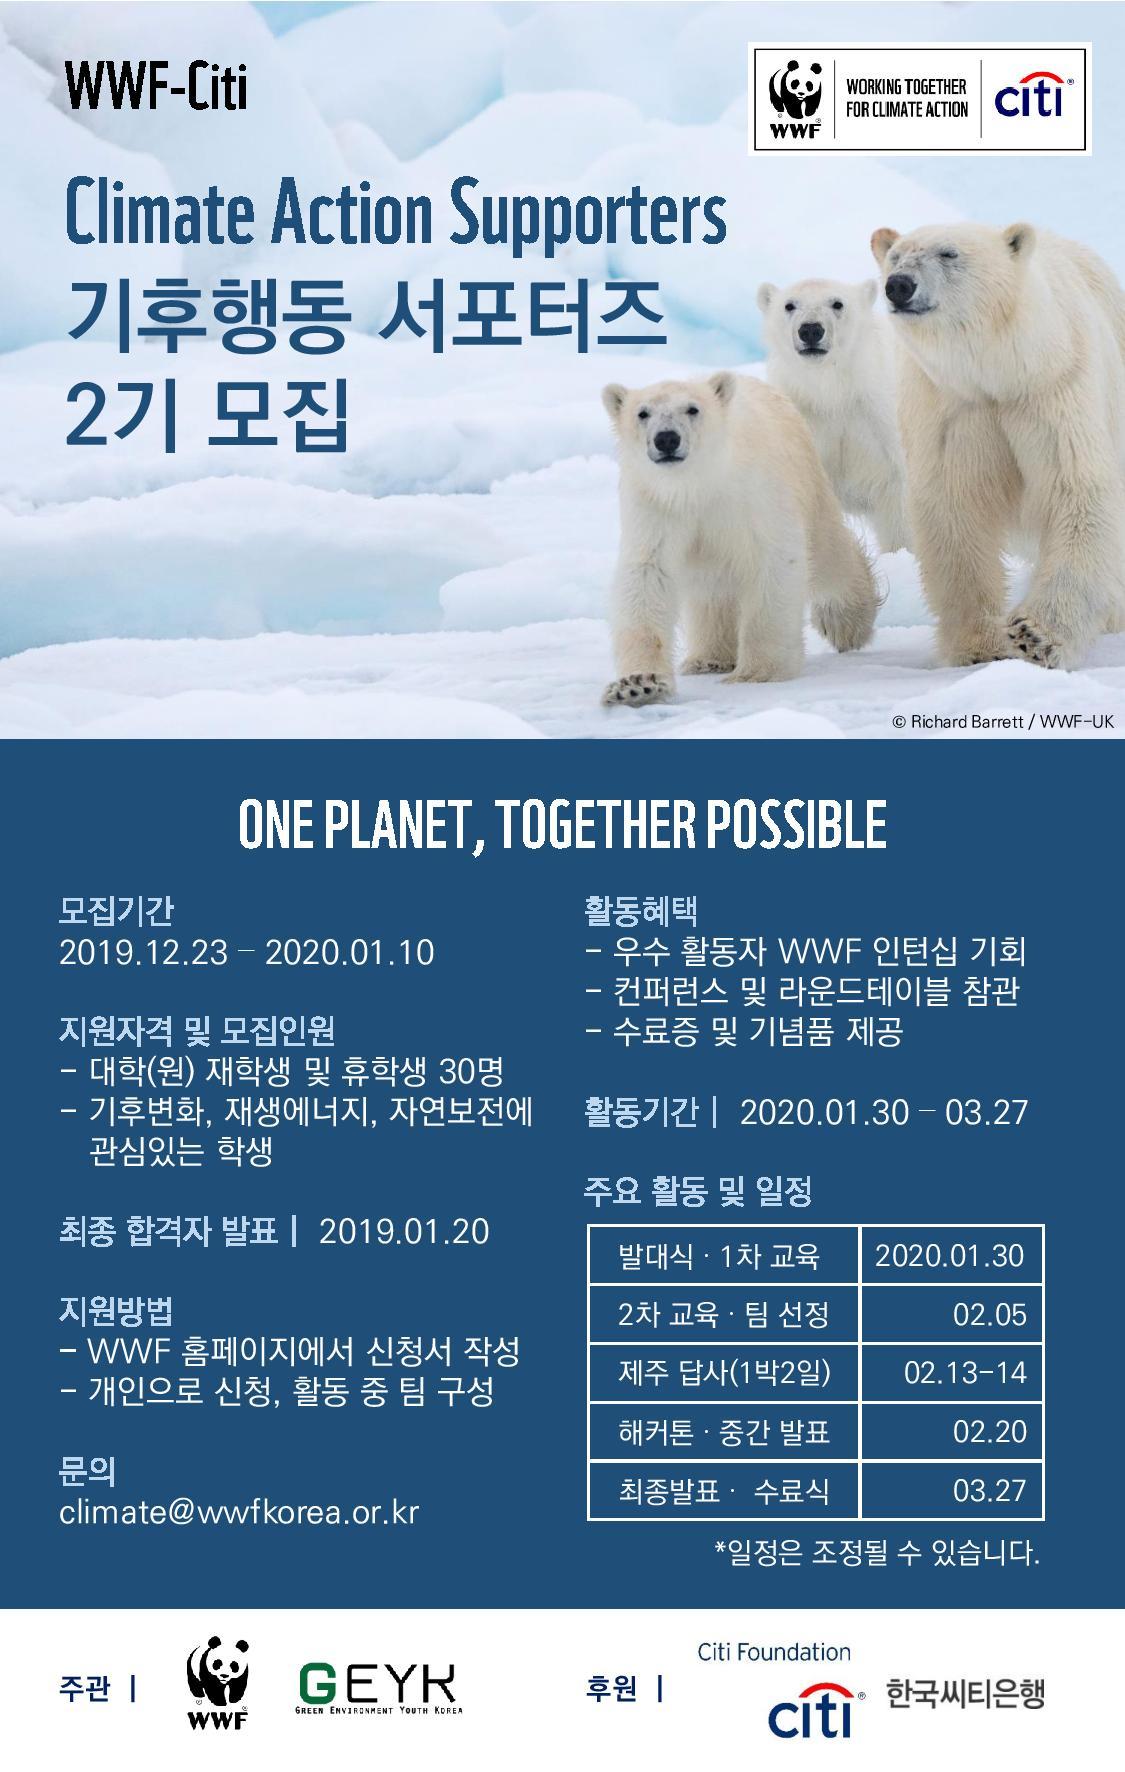 WWF-CITI 포스터_191217